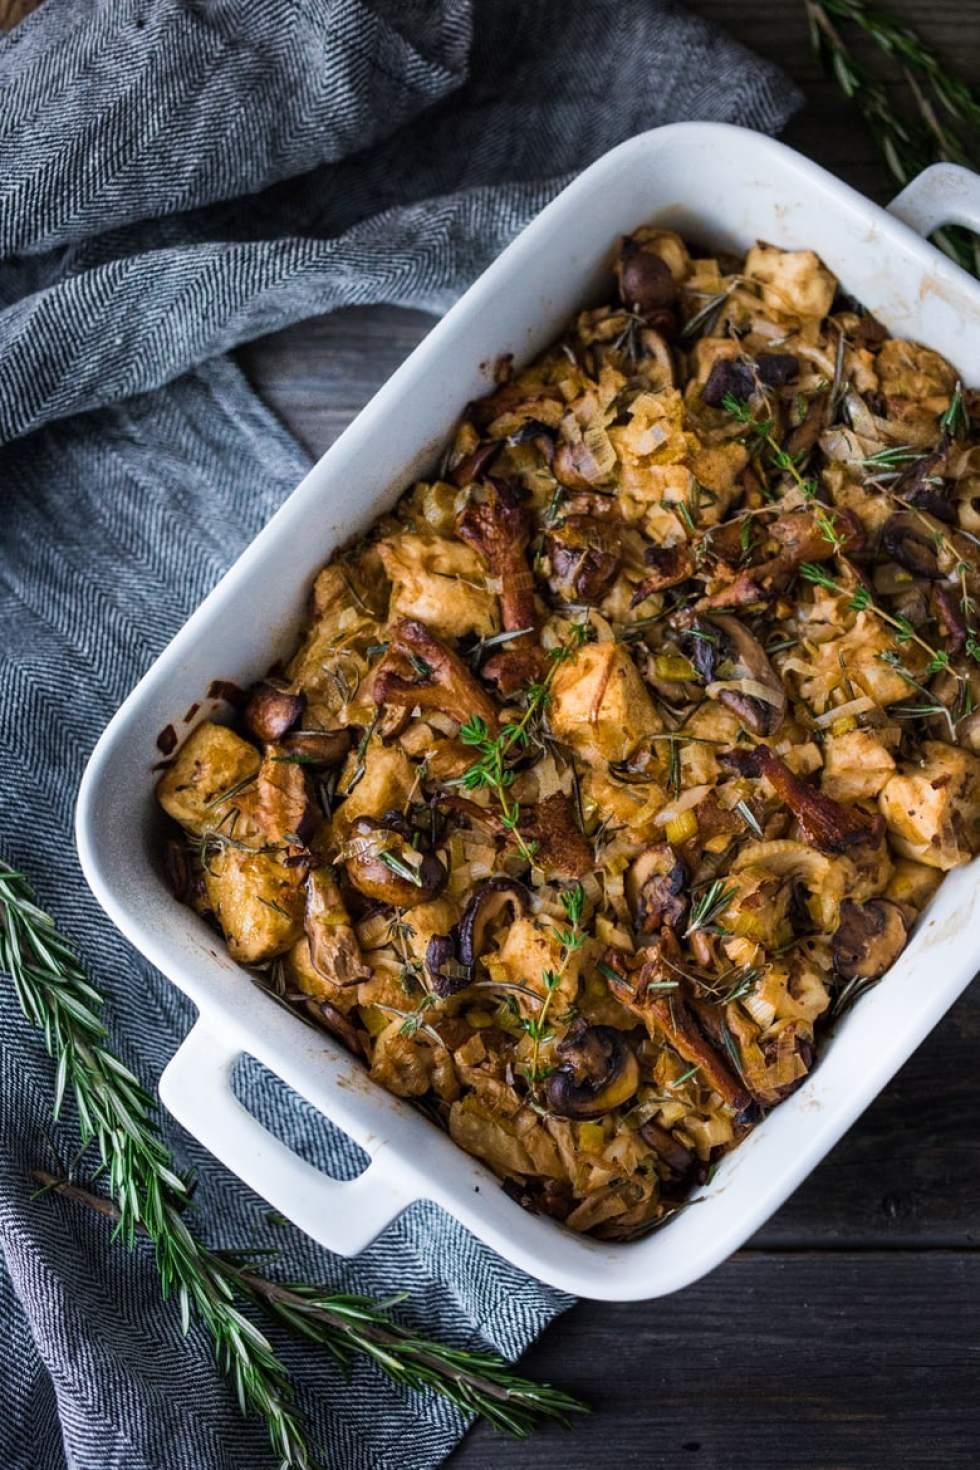 Wild Mushroom Fennel & Leek Stuffing- savory and flavorful, the perfect Thanksgiving side. | www.feastingathome.com